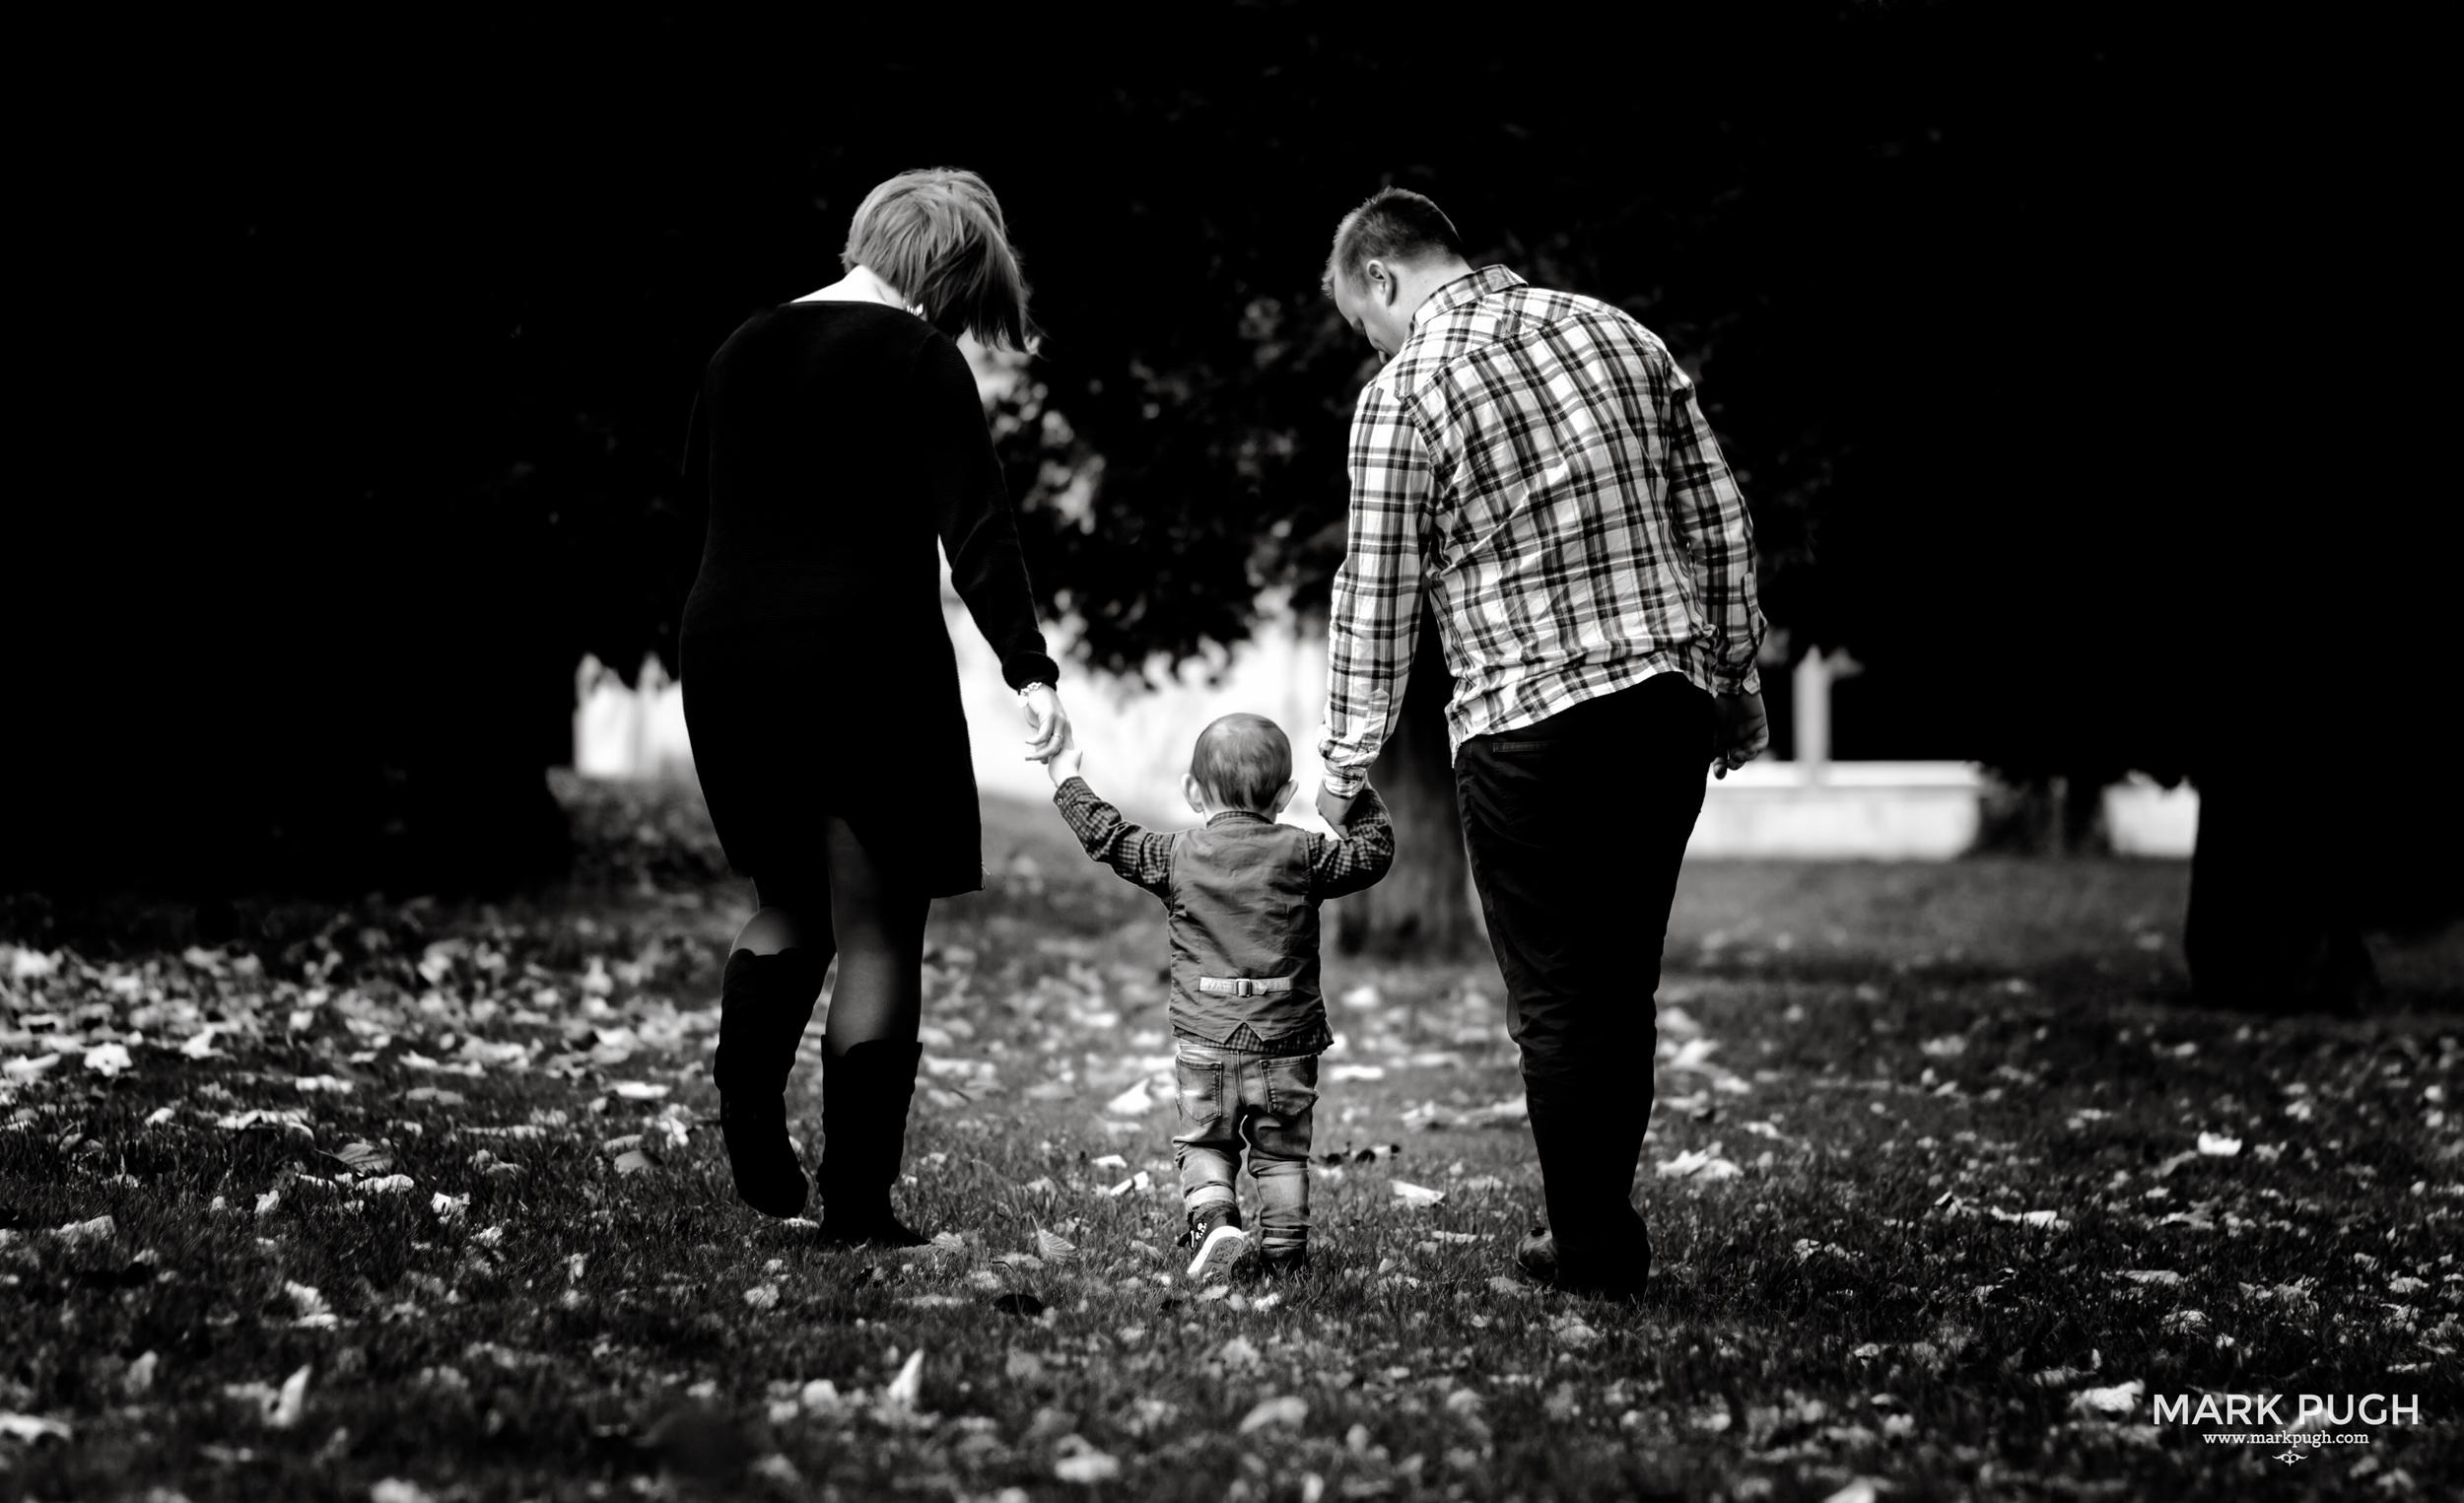 008 - Lisa Craig and Jackson - Family Photography by Mark Pugh www.markpugh.com.jpg